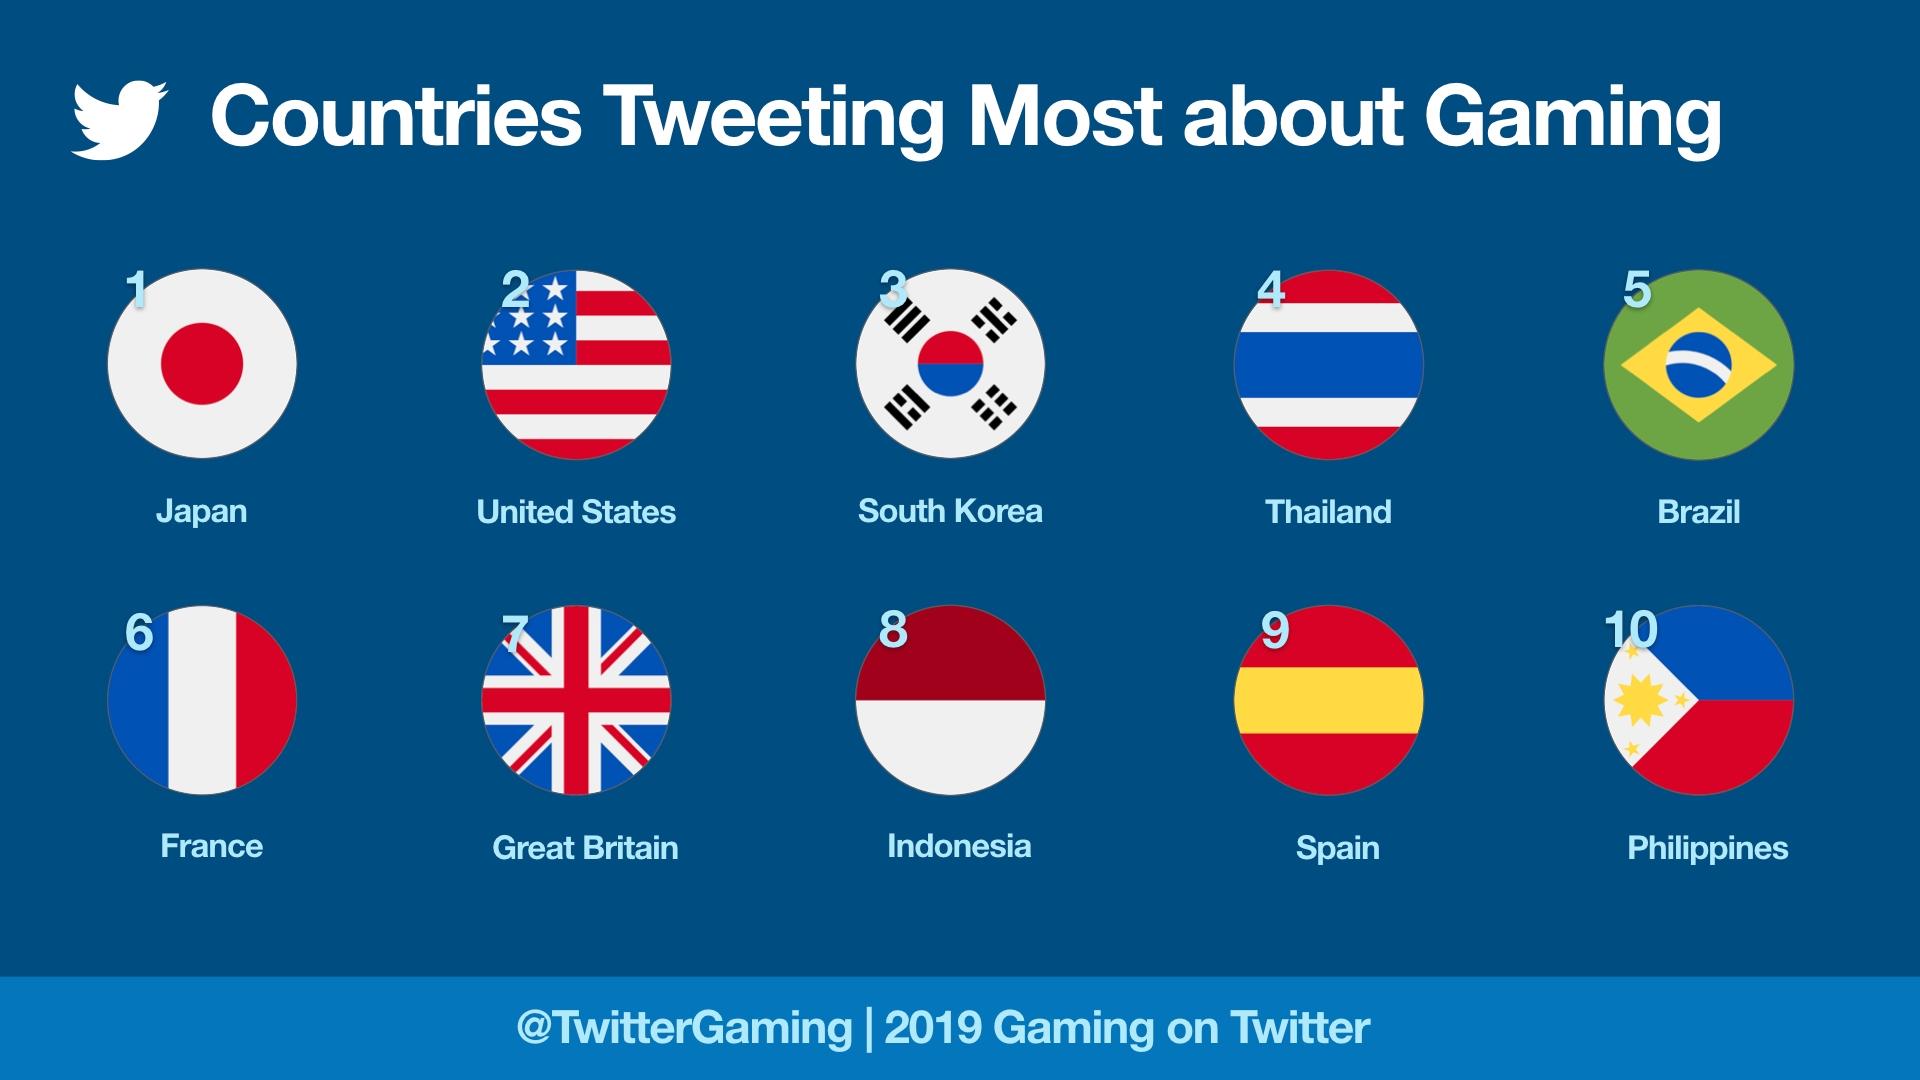 CountriesTweetingMostAboutGaming2019